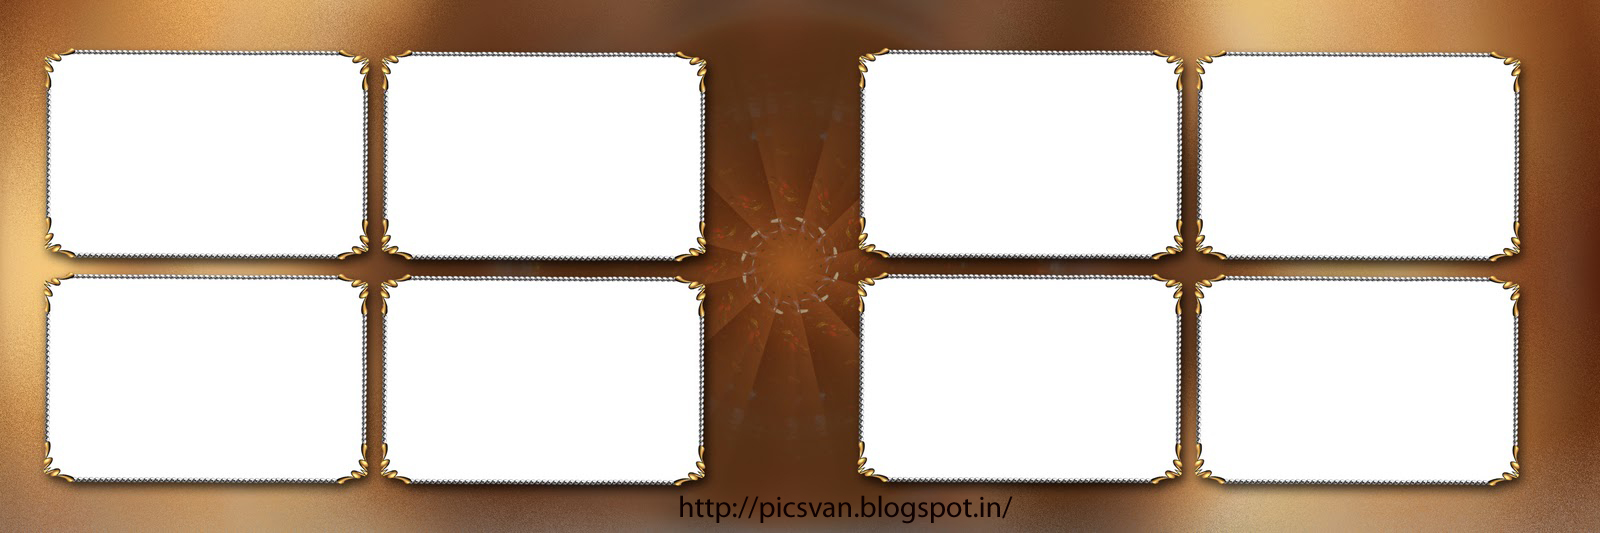 +Photo+Frames++Beautiful+Marriage++Frames+karishma+++album+++frames ...